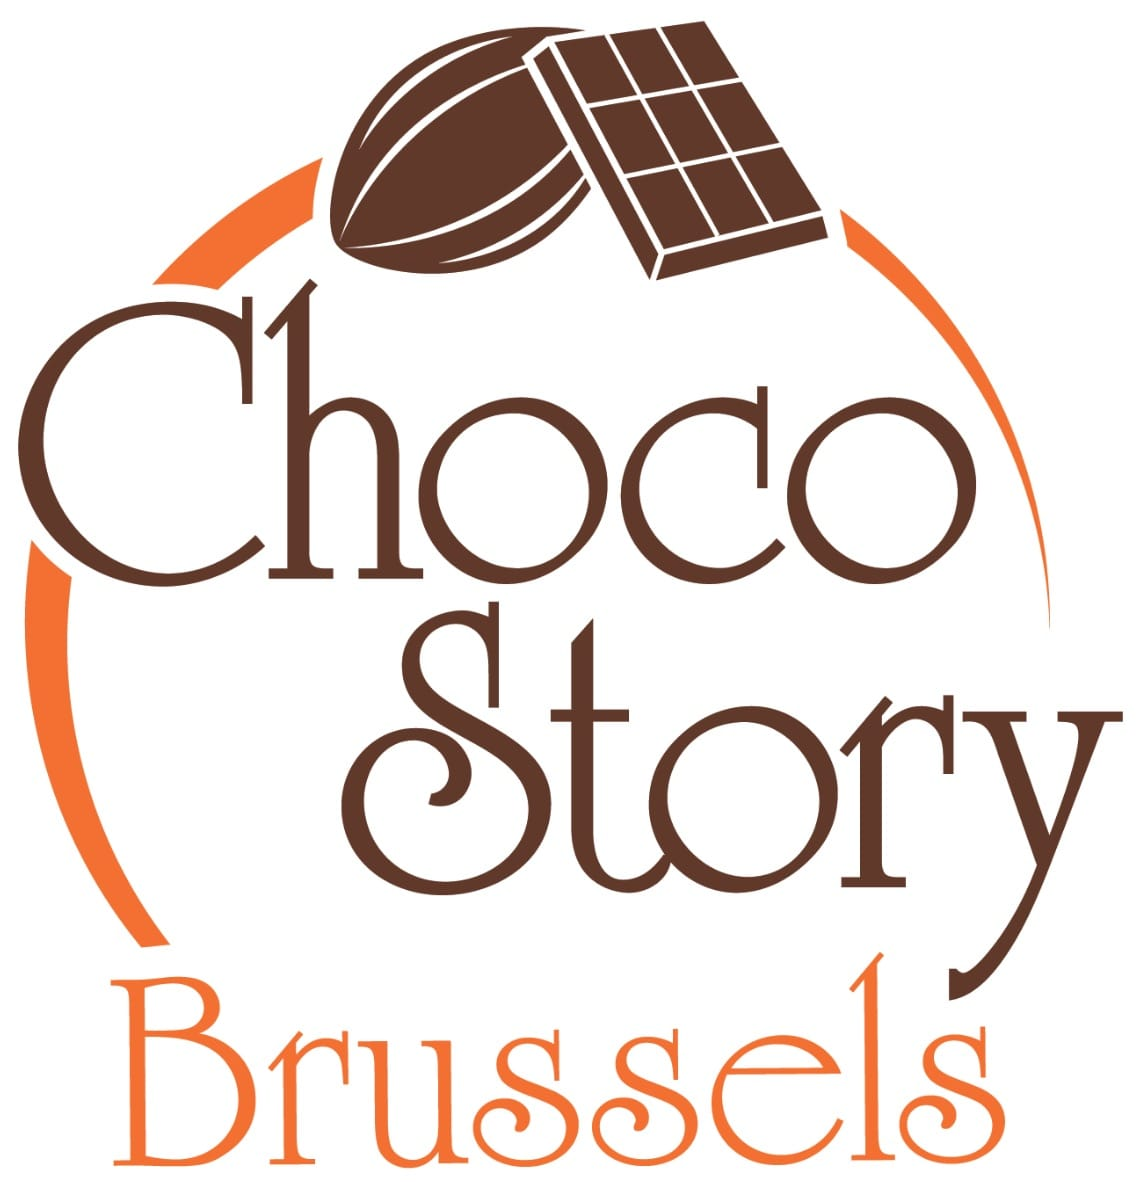 Choco-Story Brussels image logo musée du chocolat